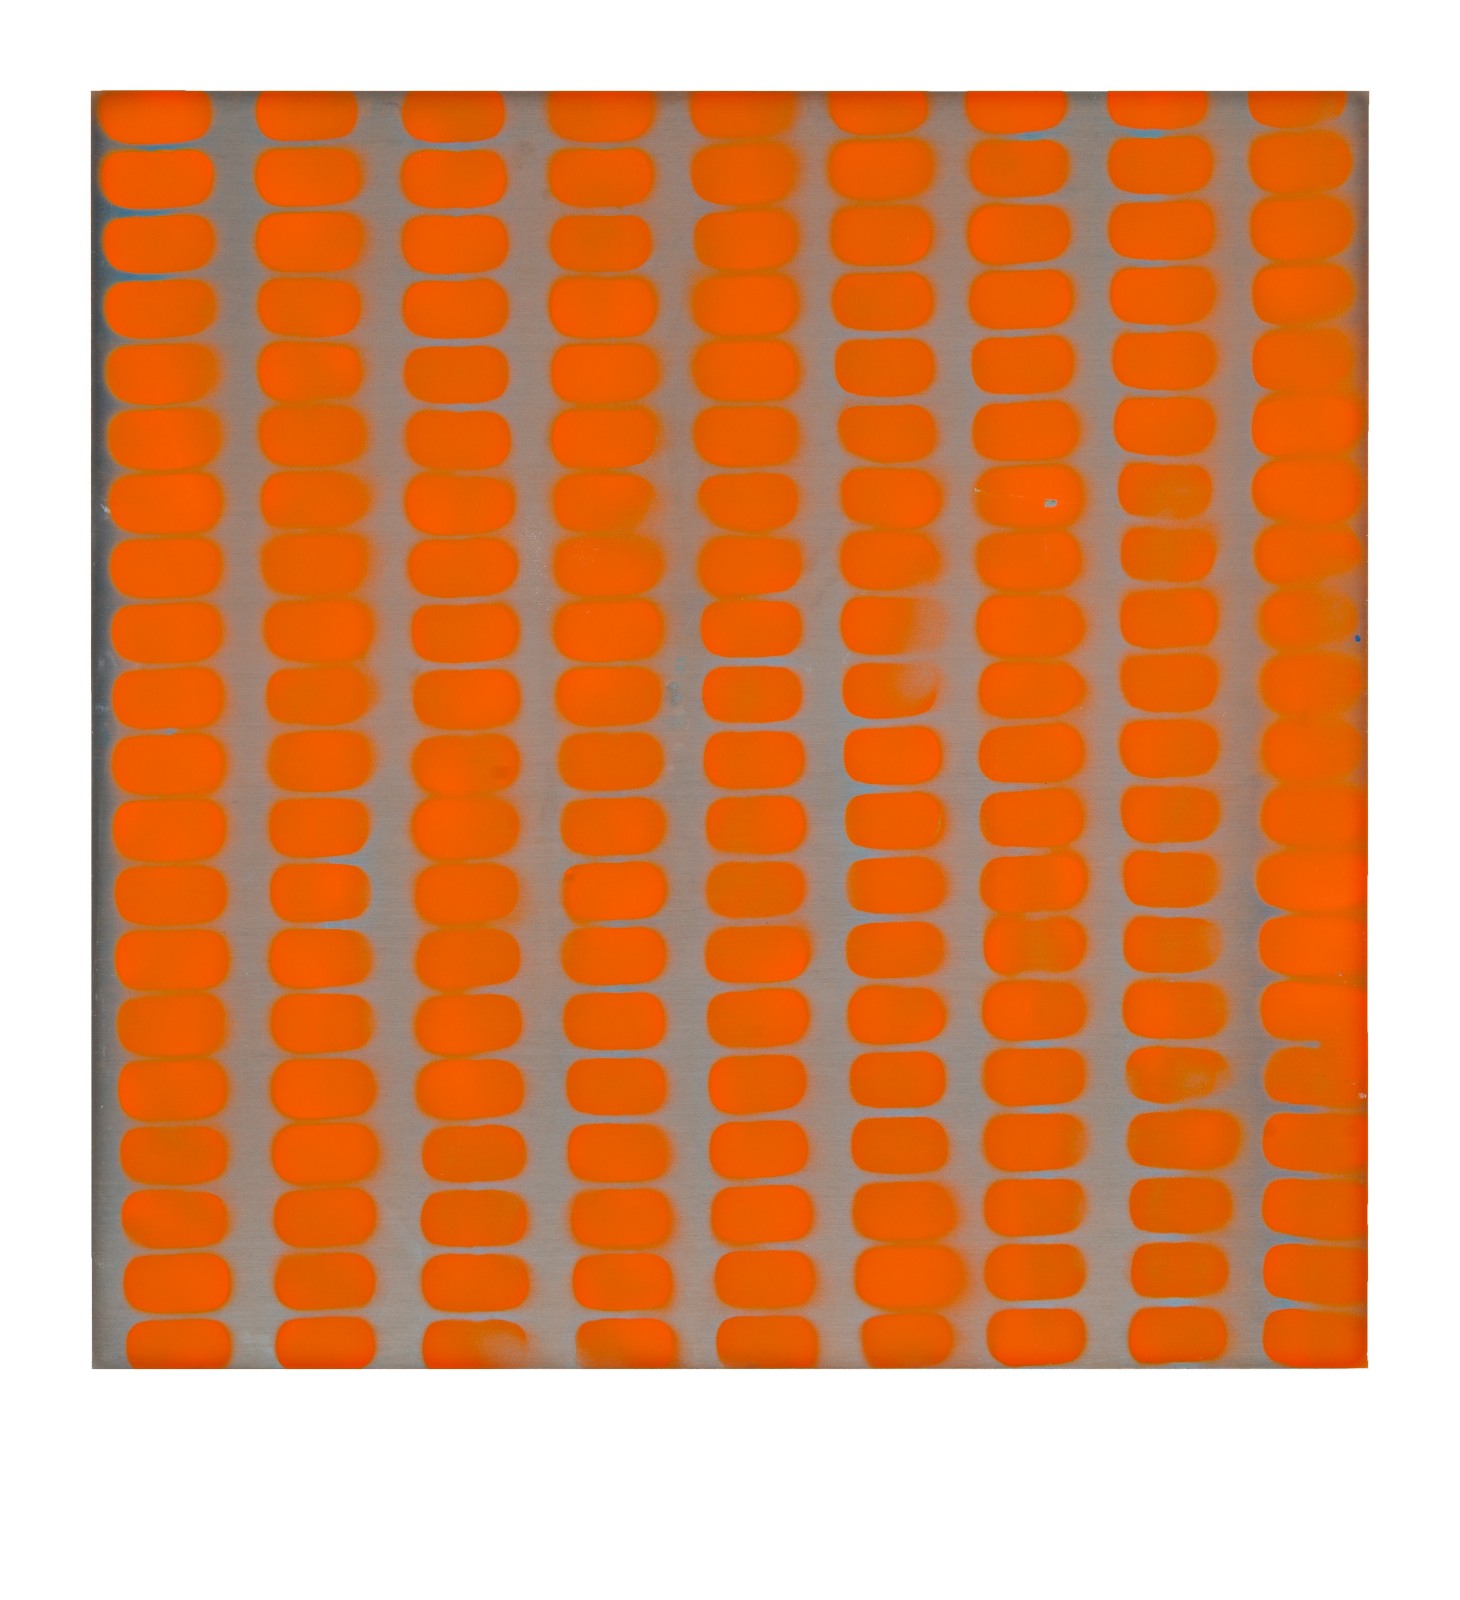 "STAIN : 40°42'51.0""N 73°56'07.7""W, 2015, spraypaint on aluminium, 81,3 x 81,3 cm"